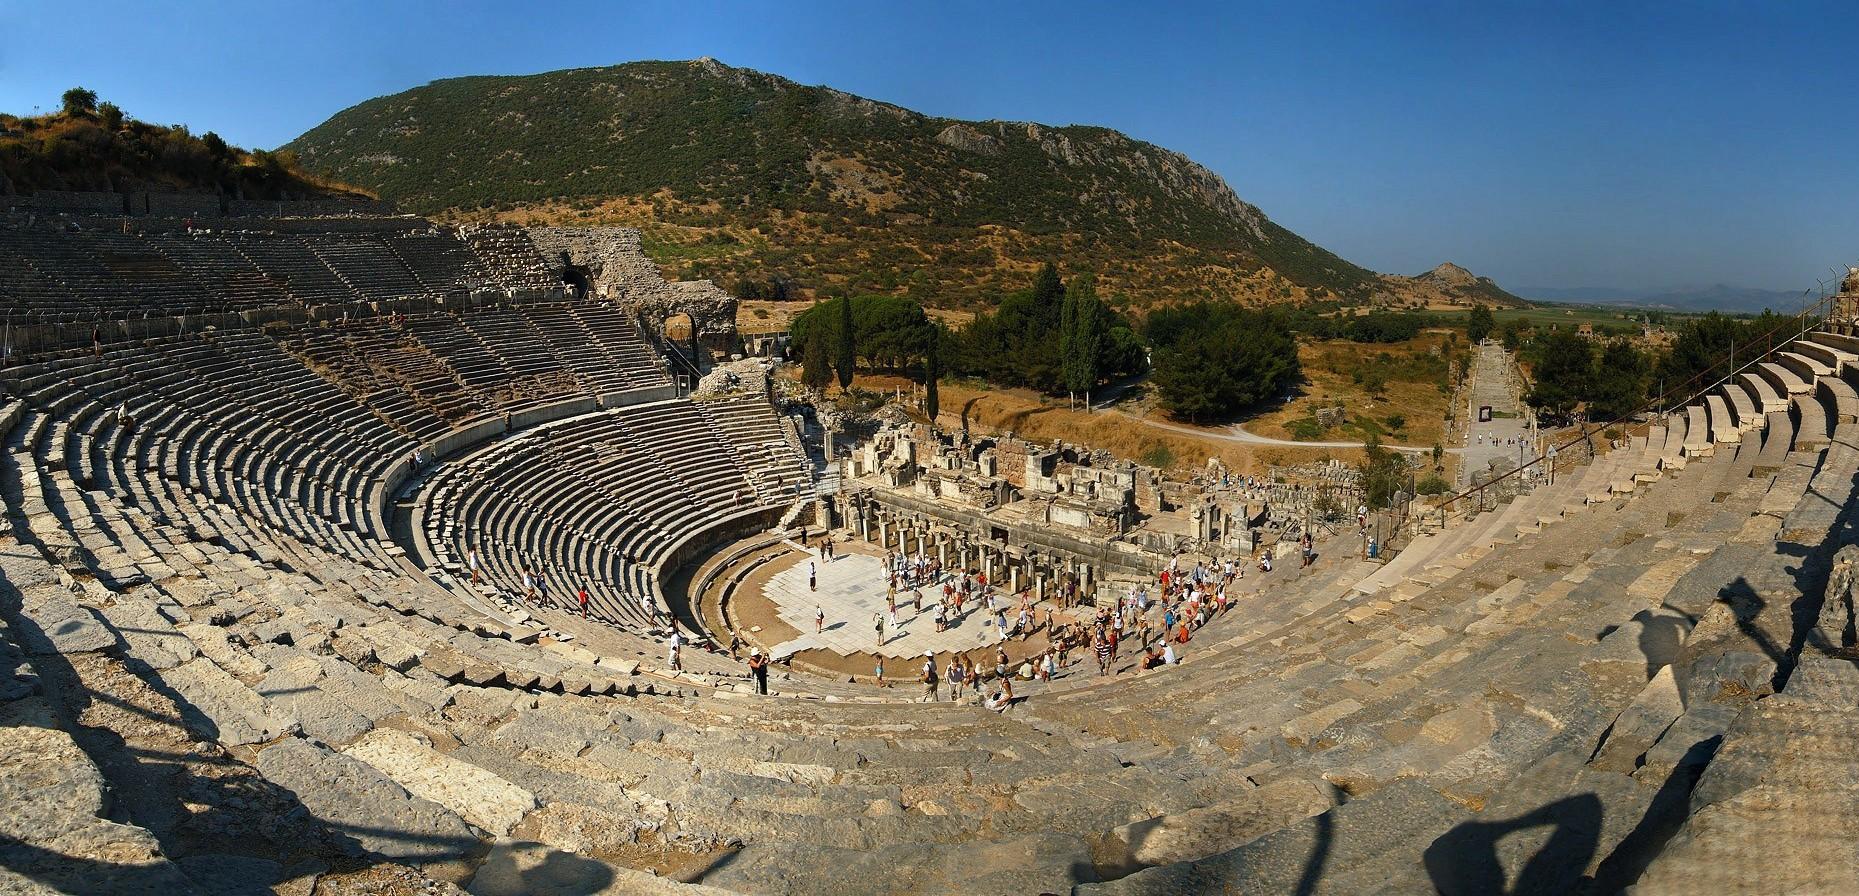 drevnegrecheskiy-teatr-gorod-efes-drevnia-grecia-panorama